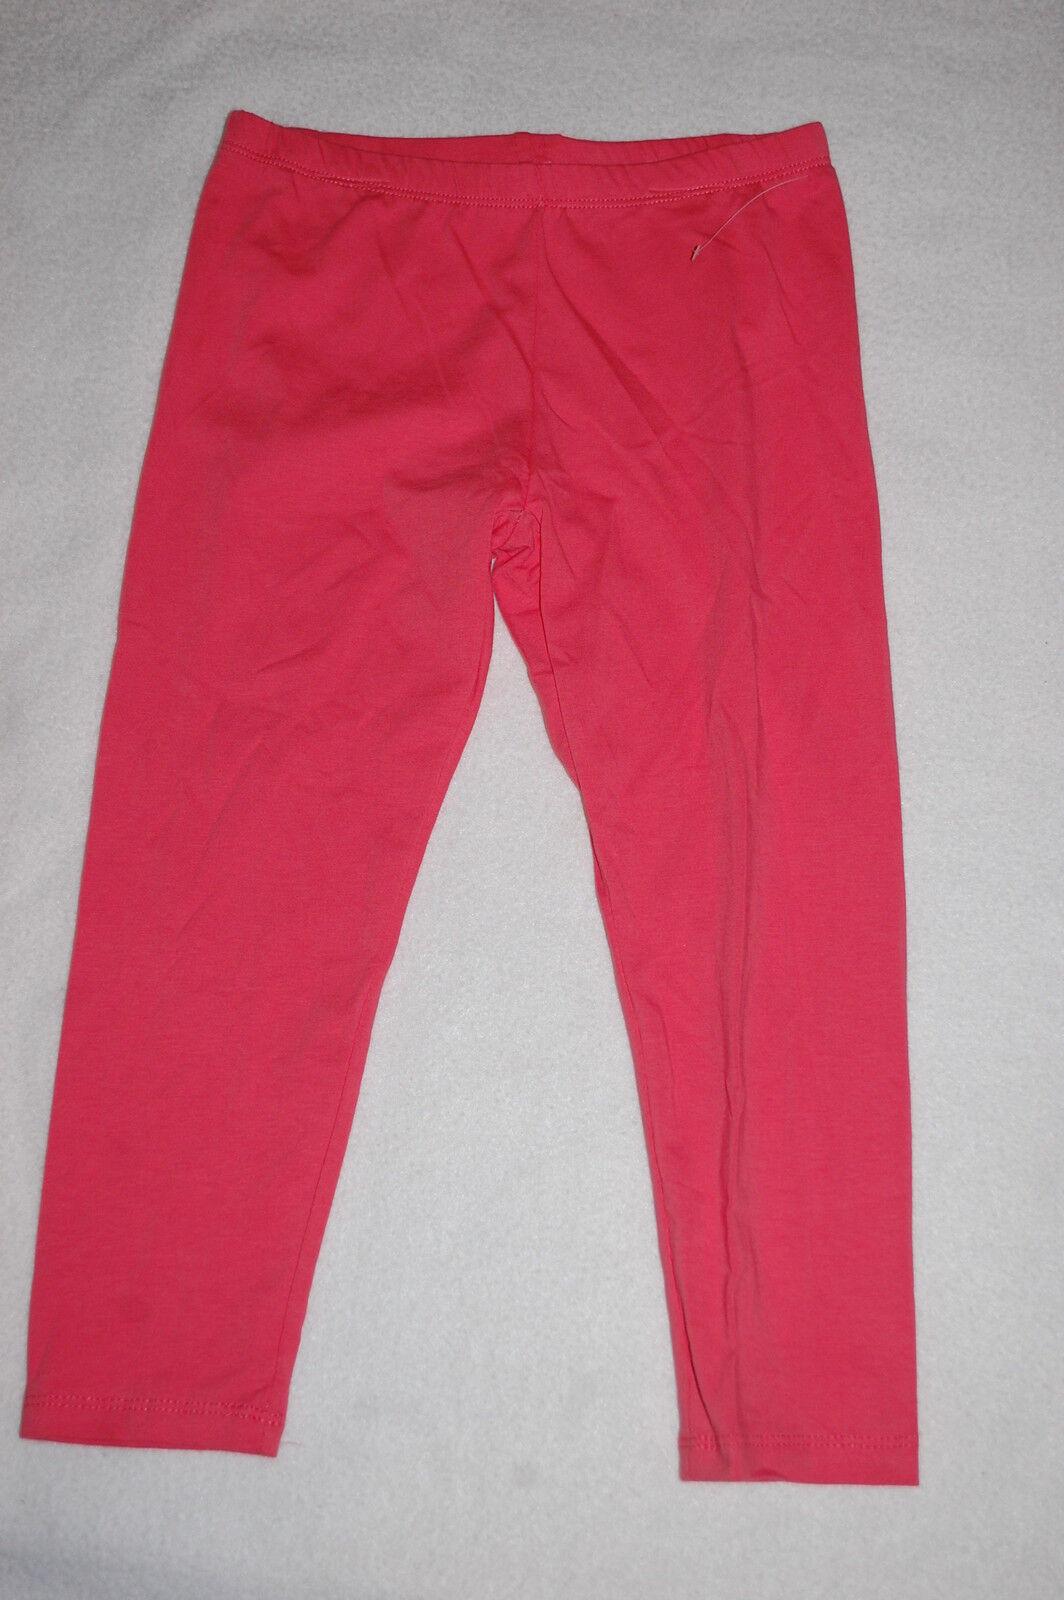 Girls Capris CORAL ORANGE CROPPED LEGGINGS Size M 7-8 for sale online